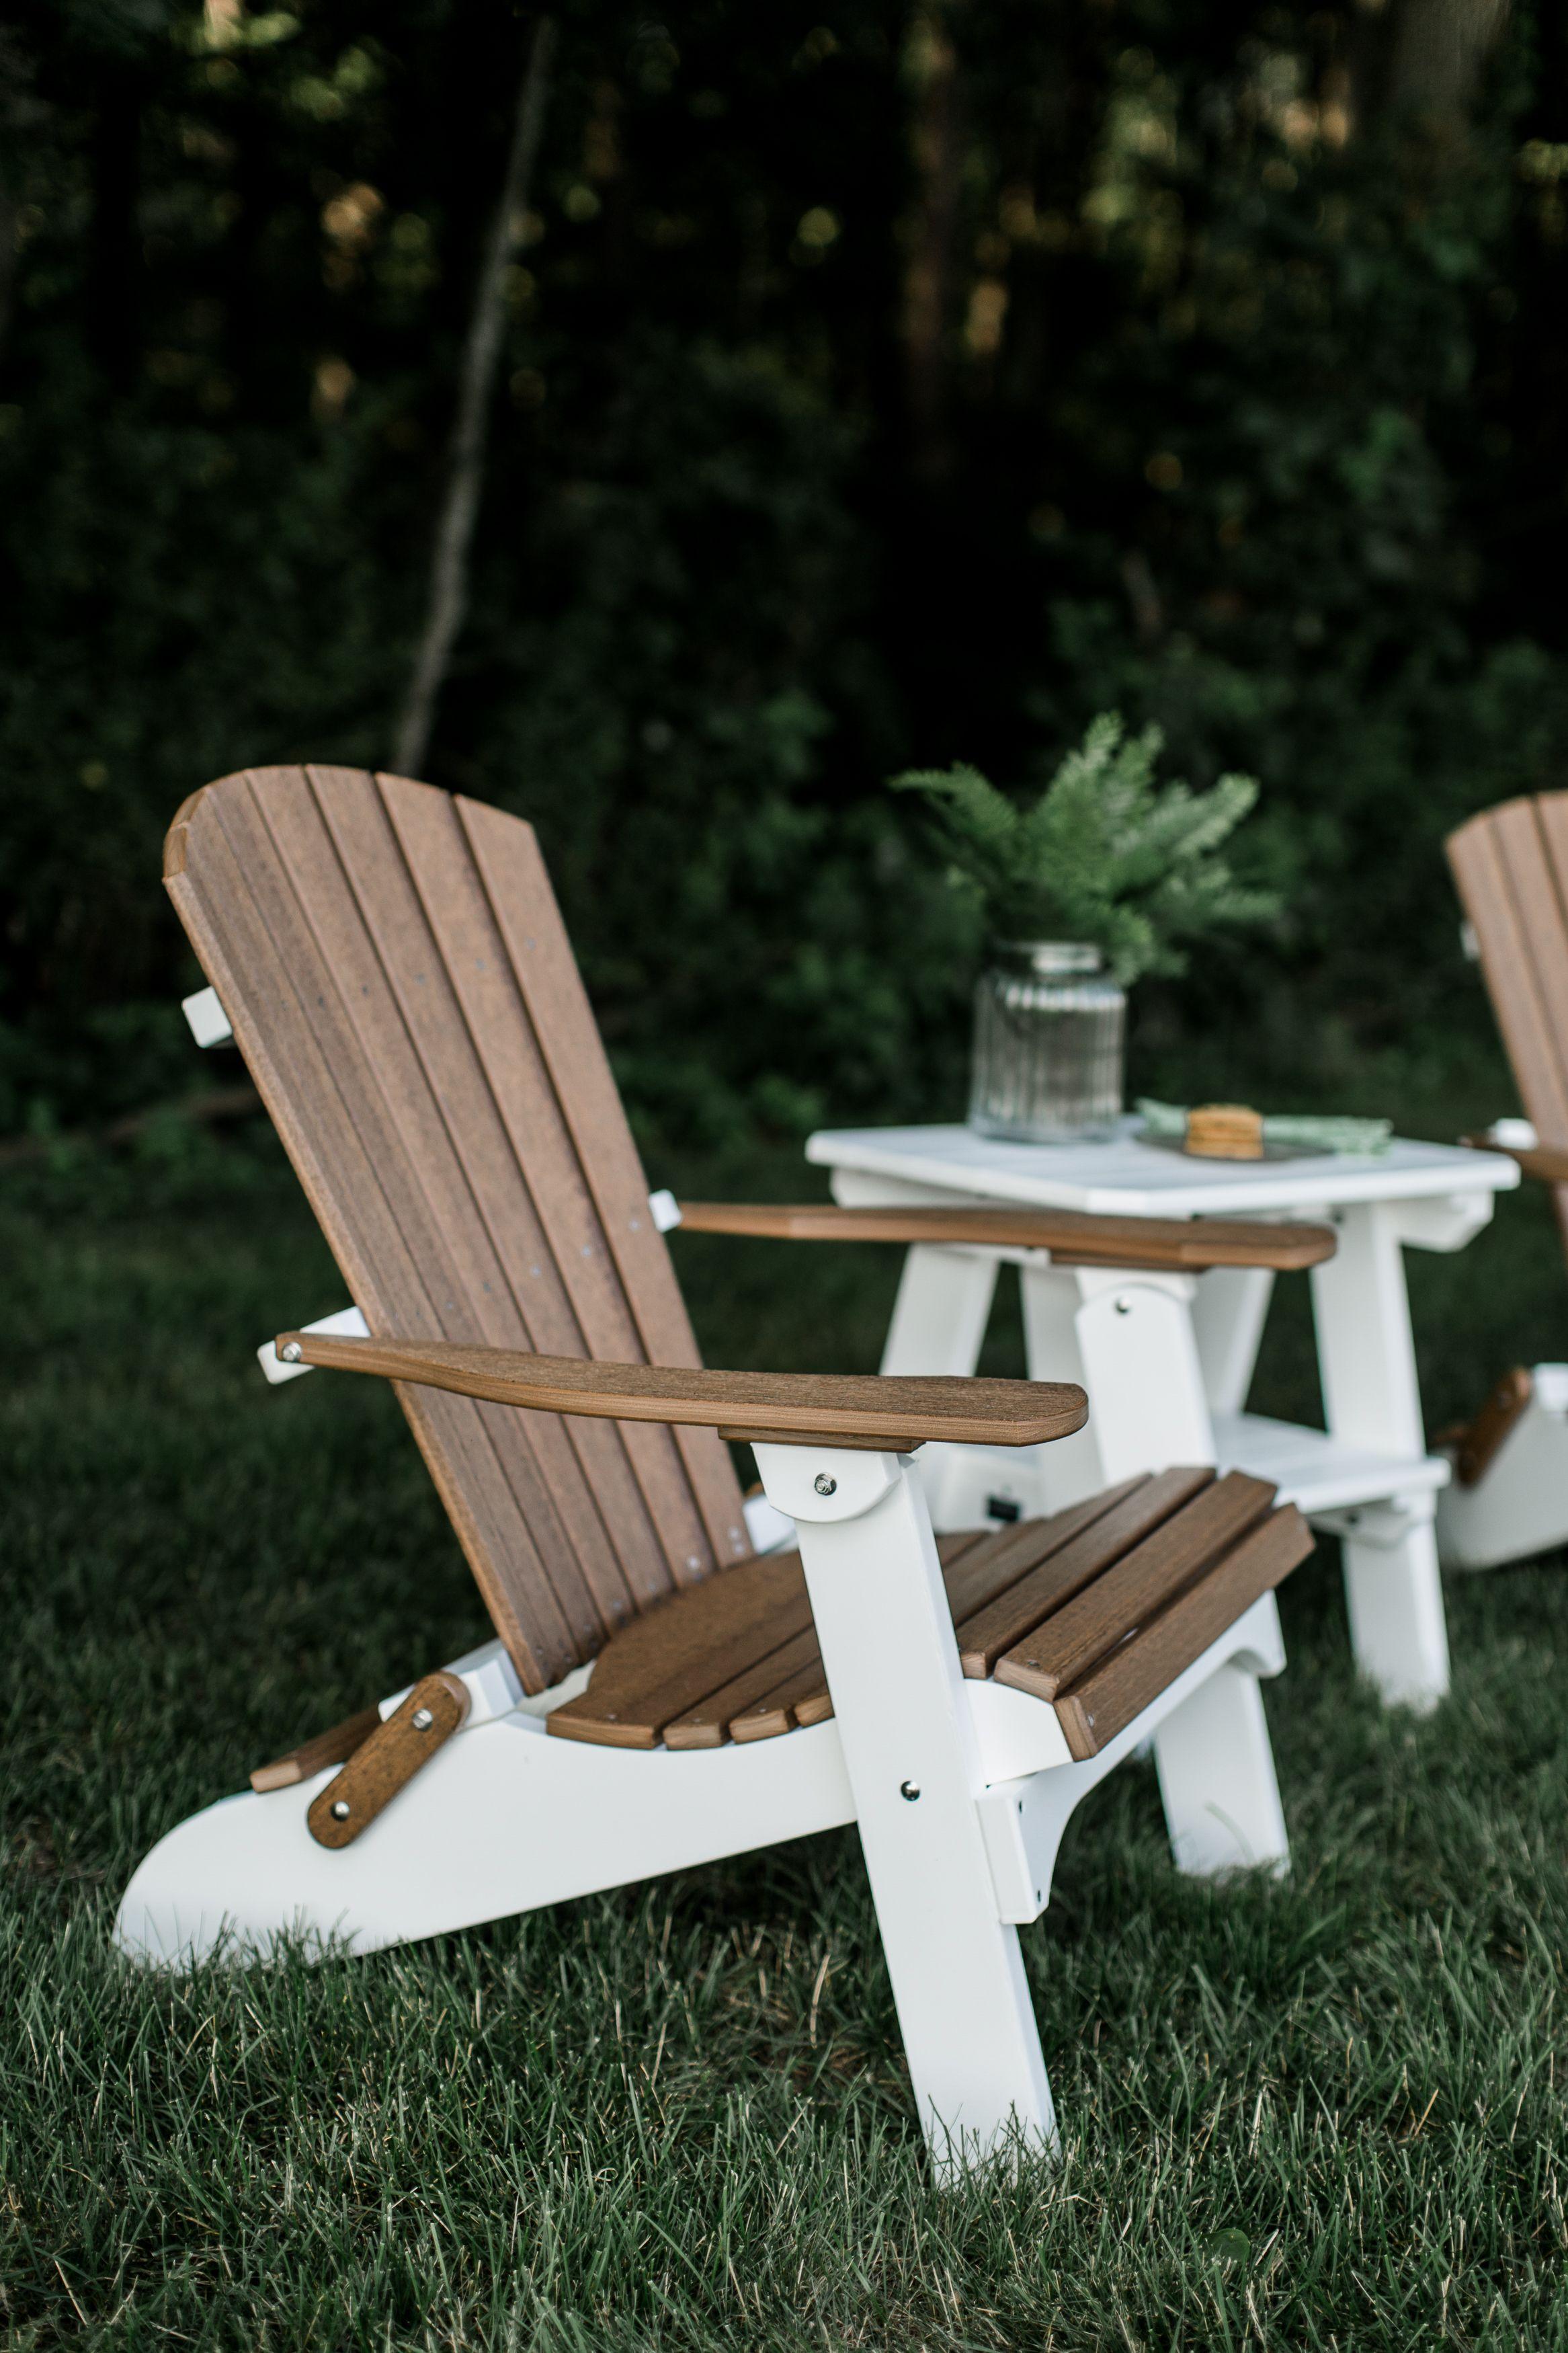 Legacy Folding Adirondack Chair In 2019 Bauidee Diy